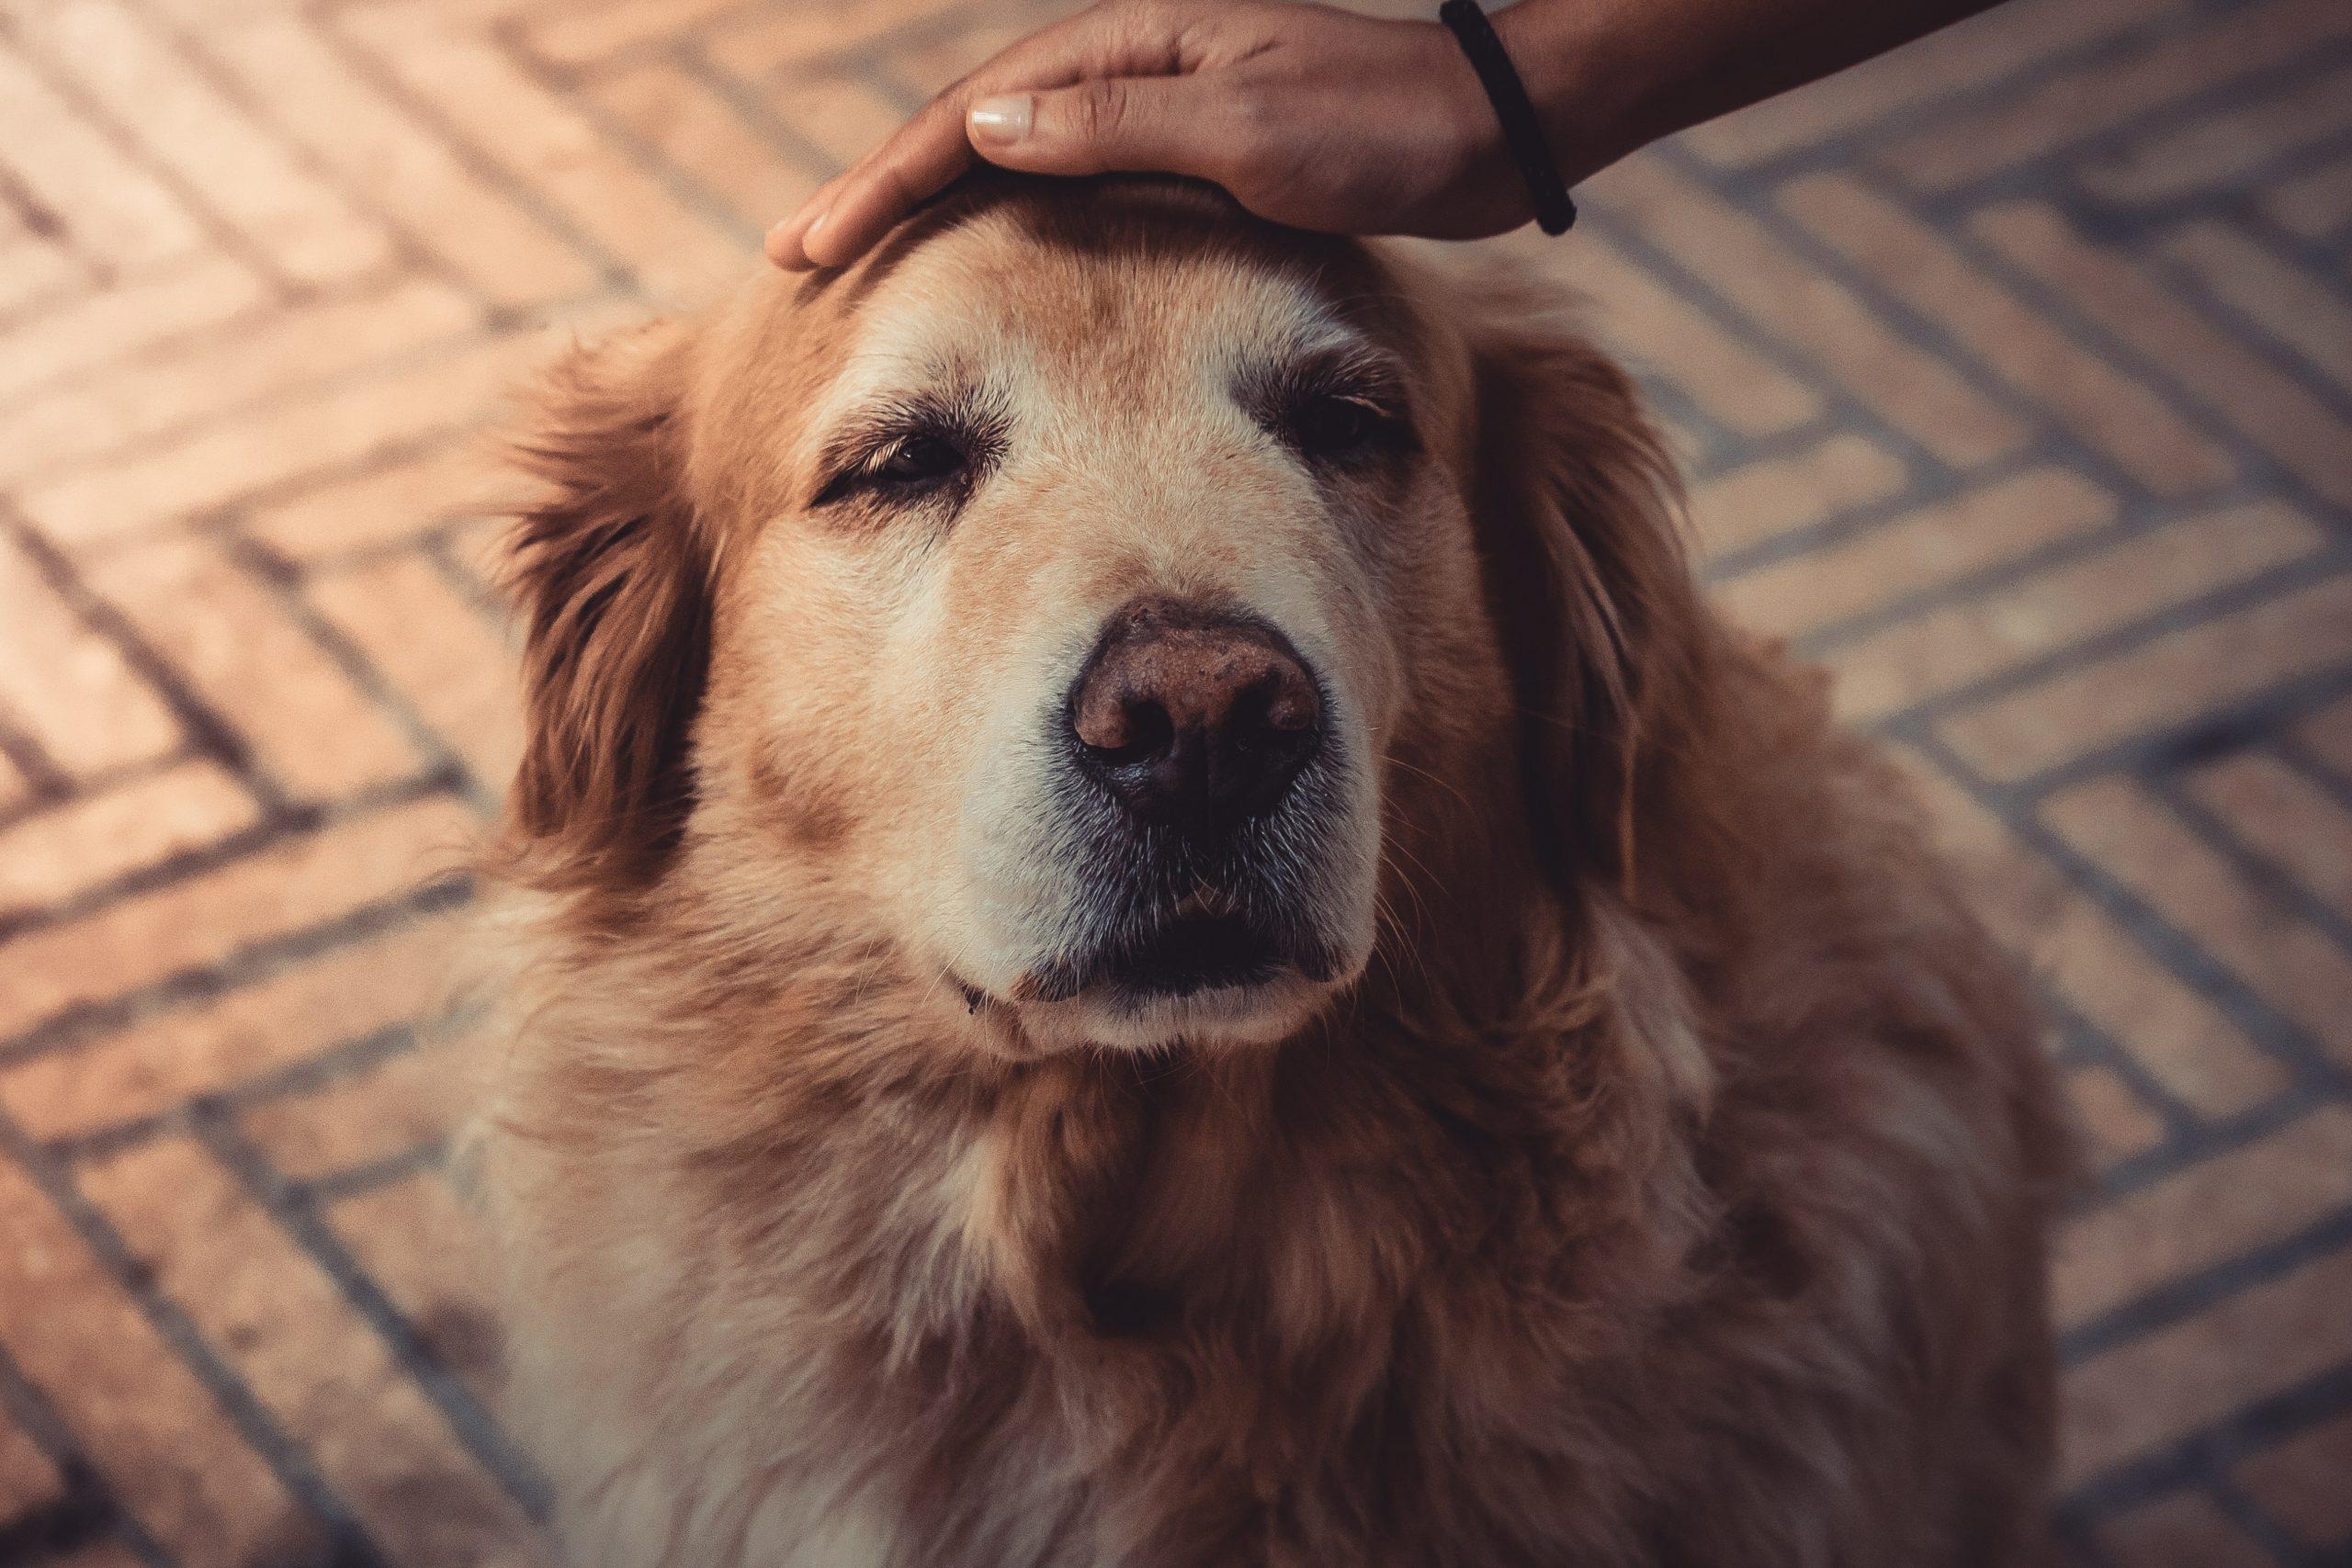 senior dogs make terrific companions